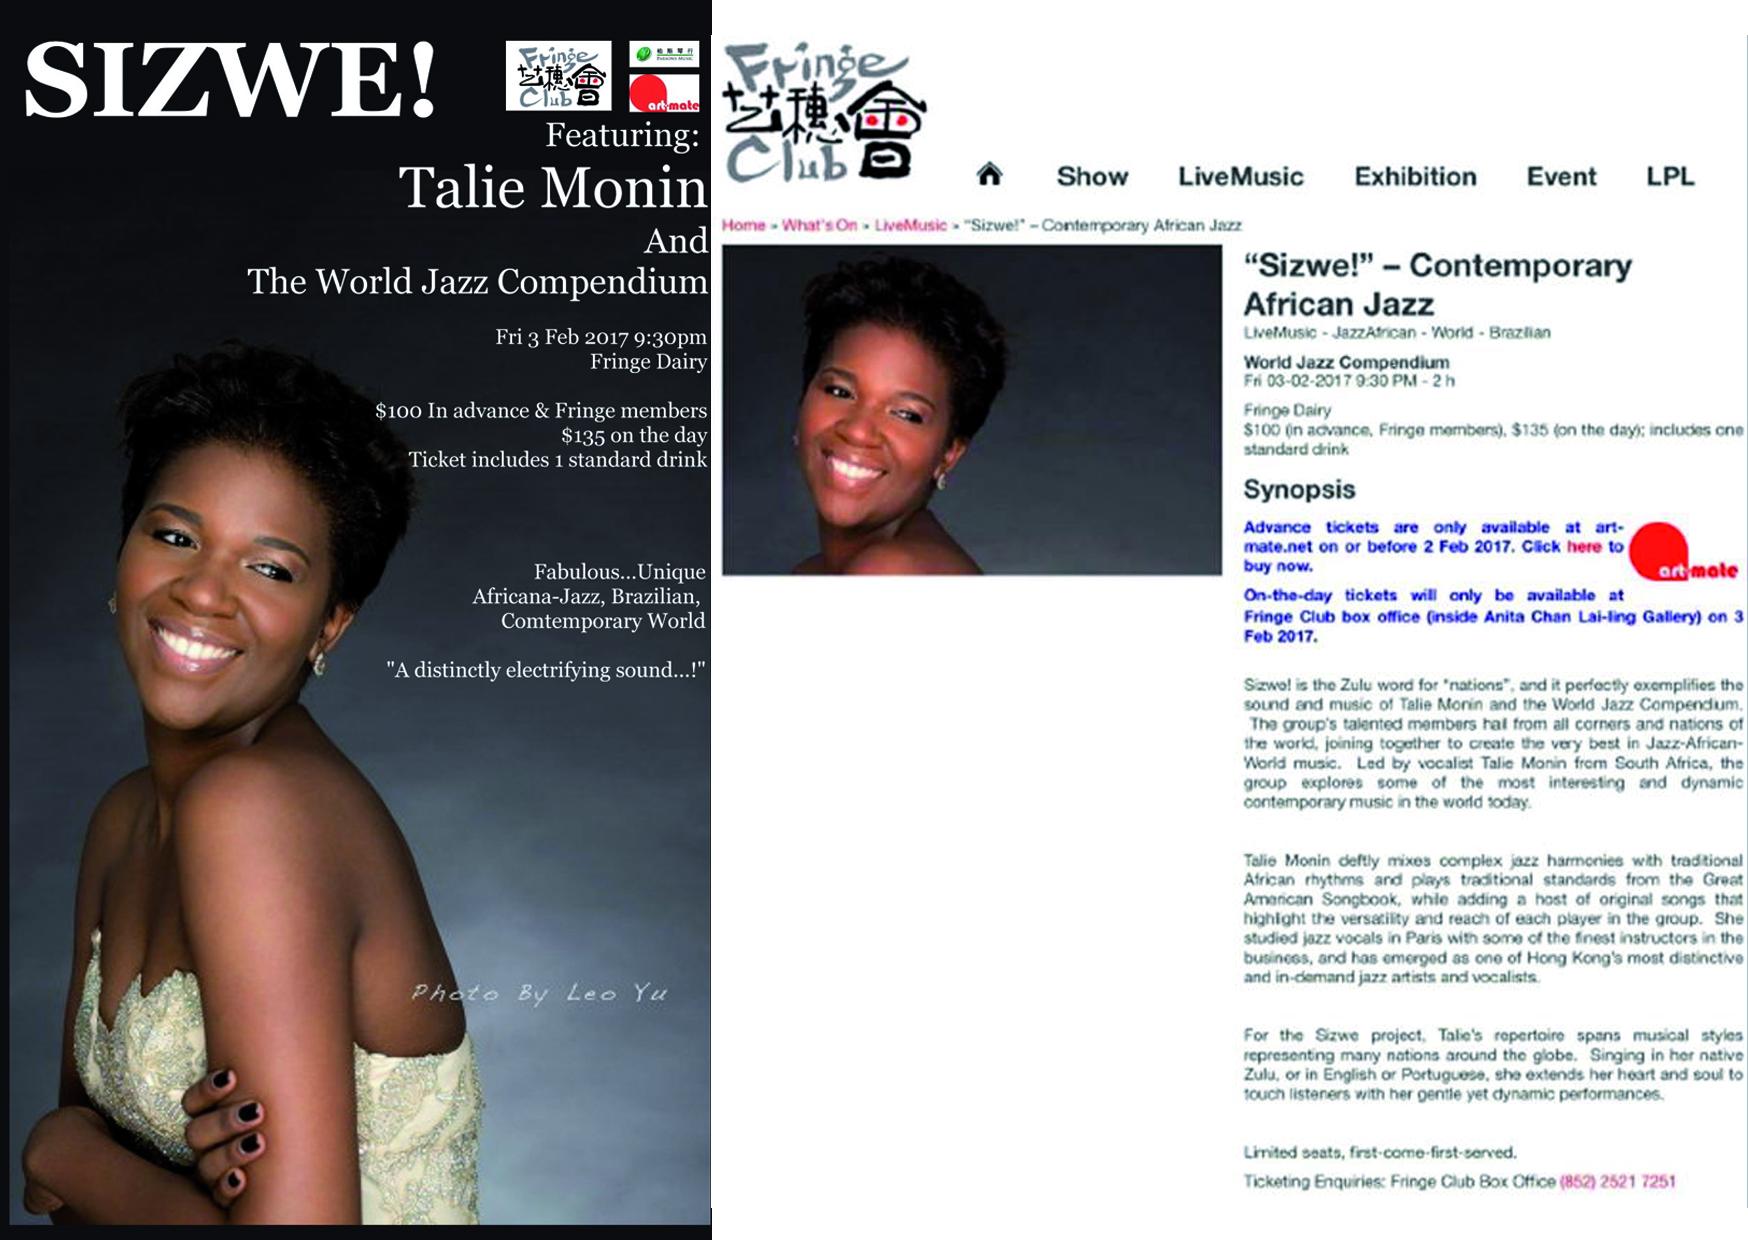 Fringe Club Poster 2-Nqobile Mchunu (Talie Monin).jpg